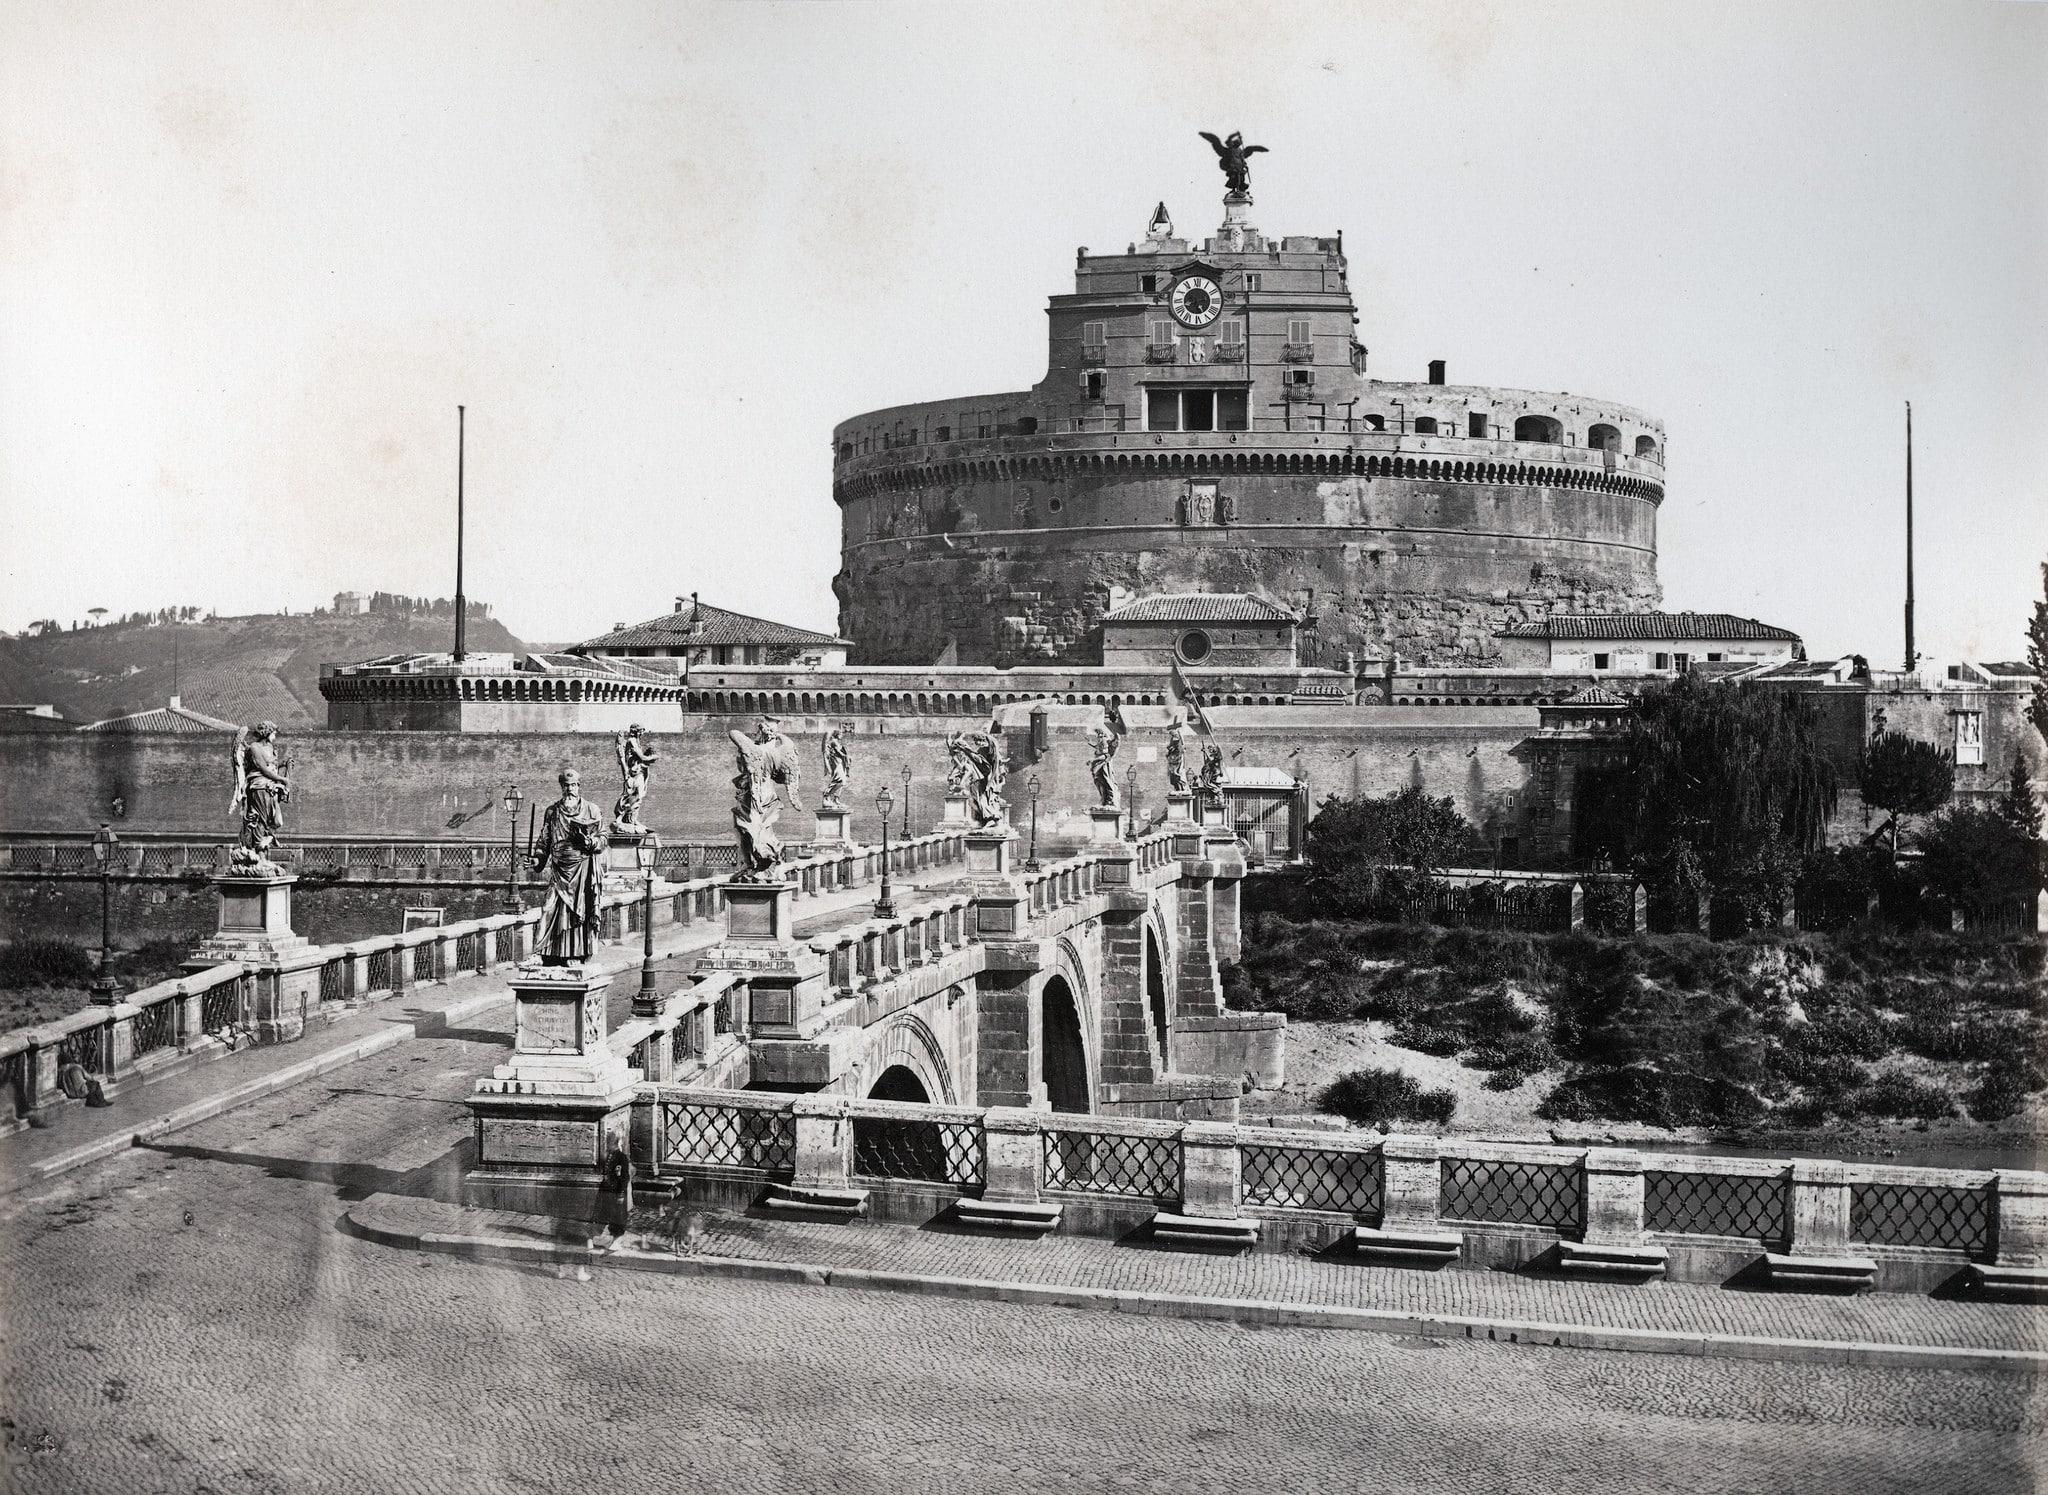 Pompeo Molins - Castel Sant' Angelo, ca 1860